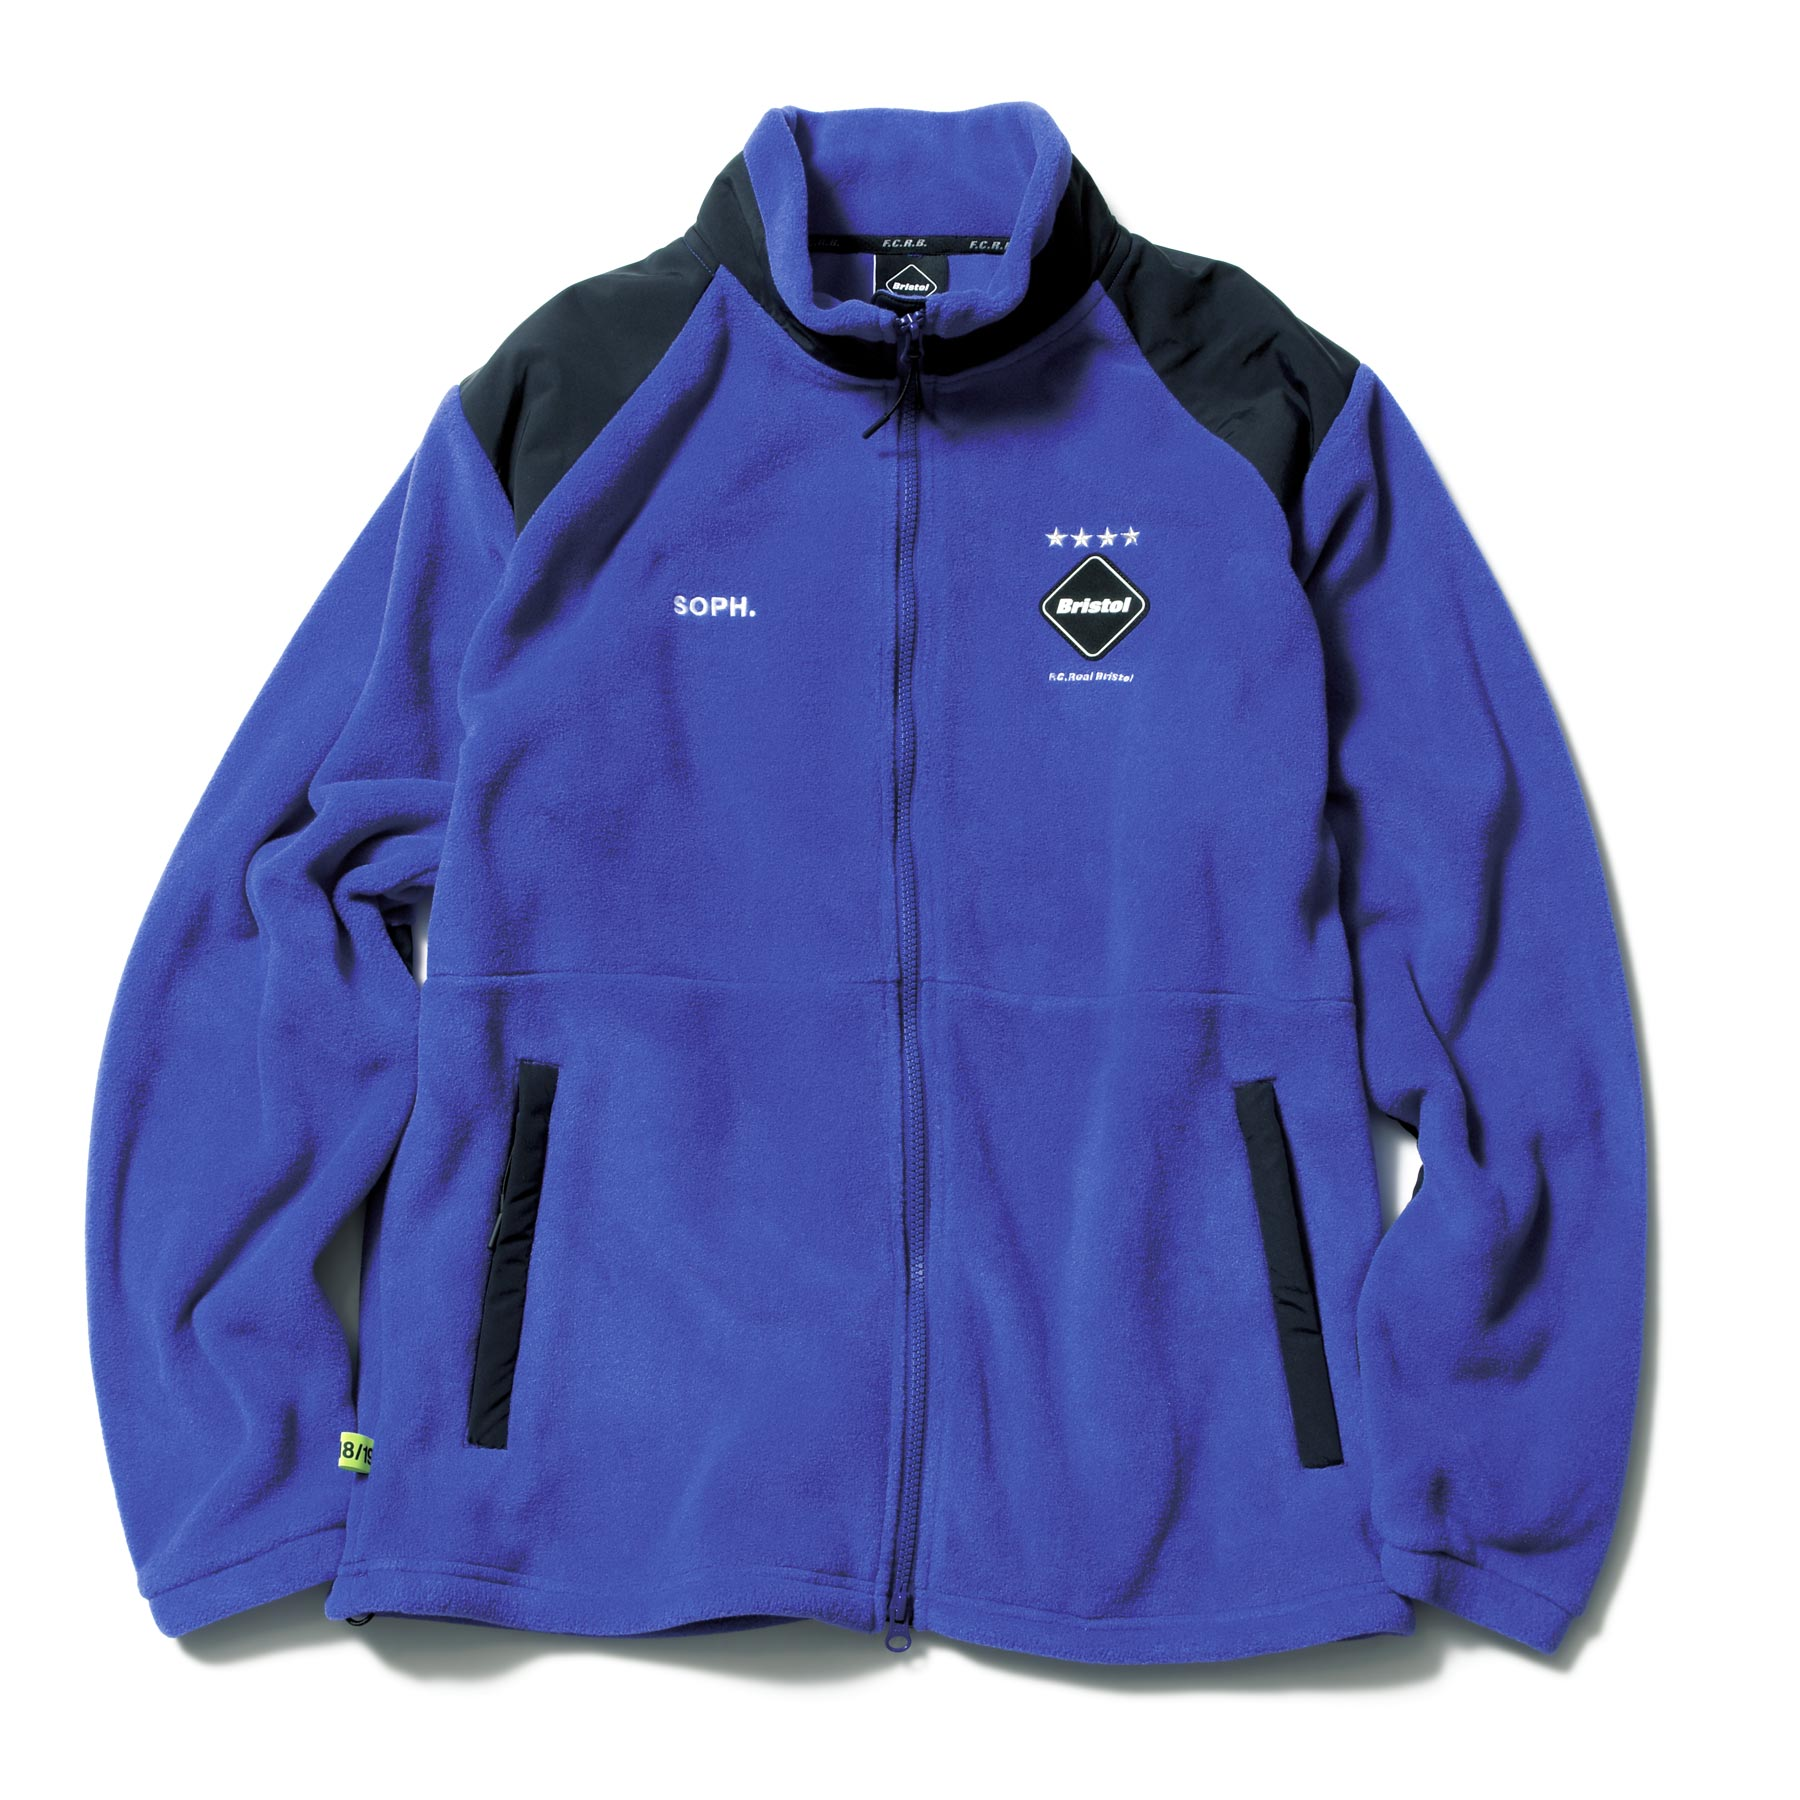 F.C.Real Bristol / POLARTEC FLEECE STAND COLLAR BLOUSON -BLUE